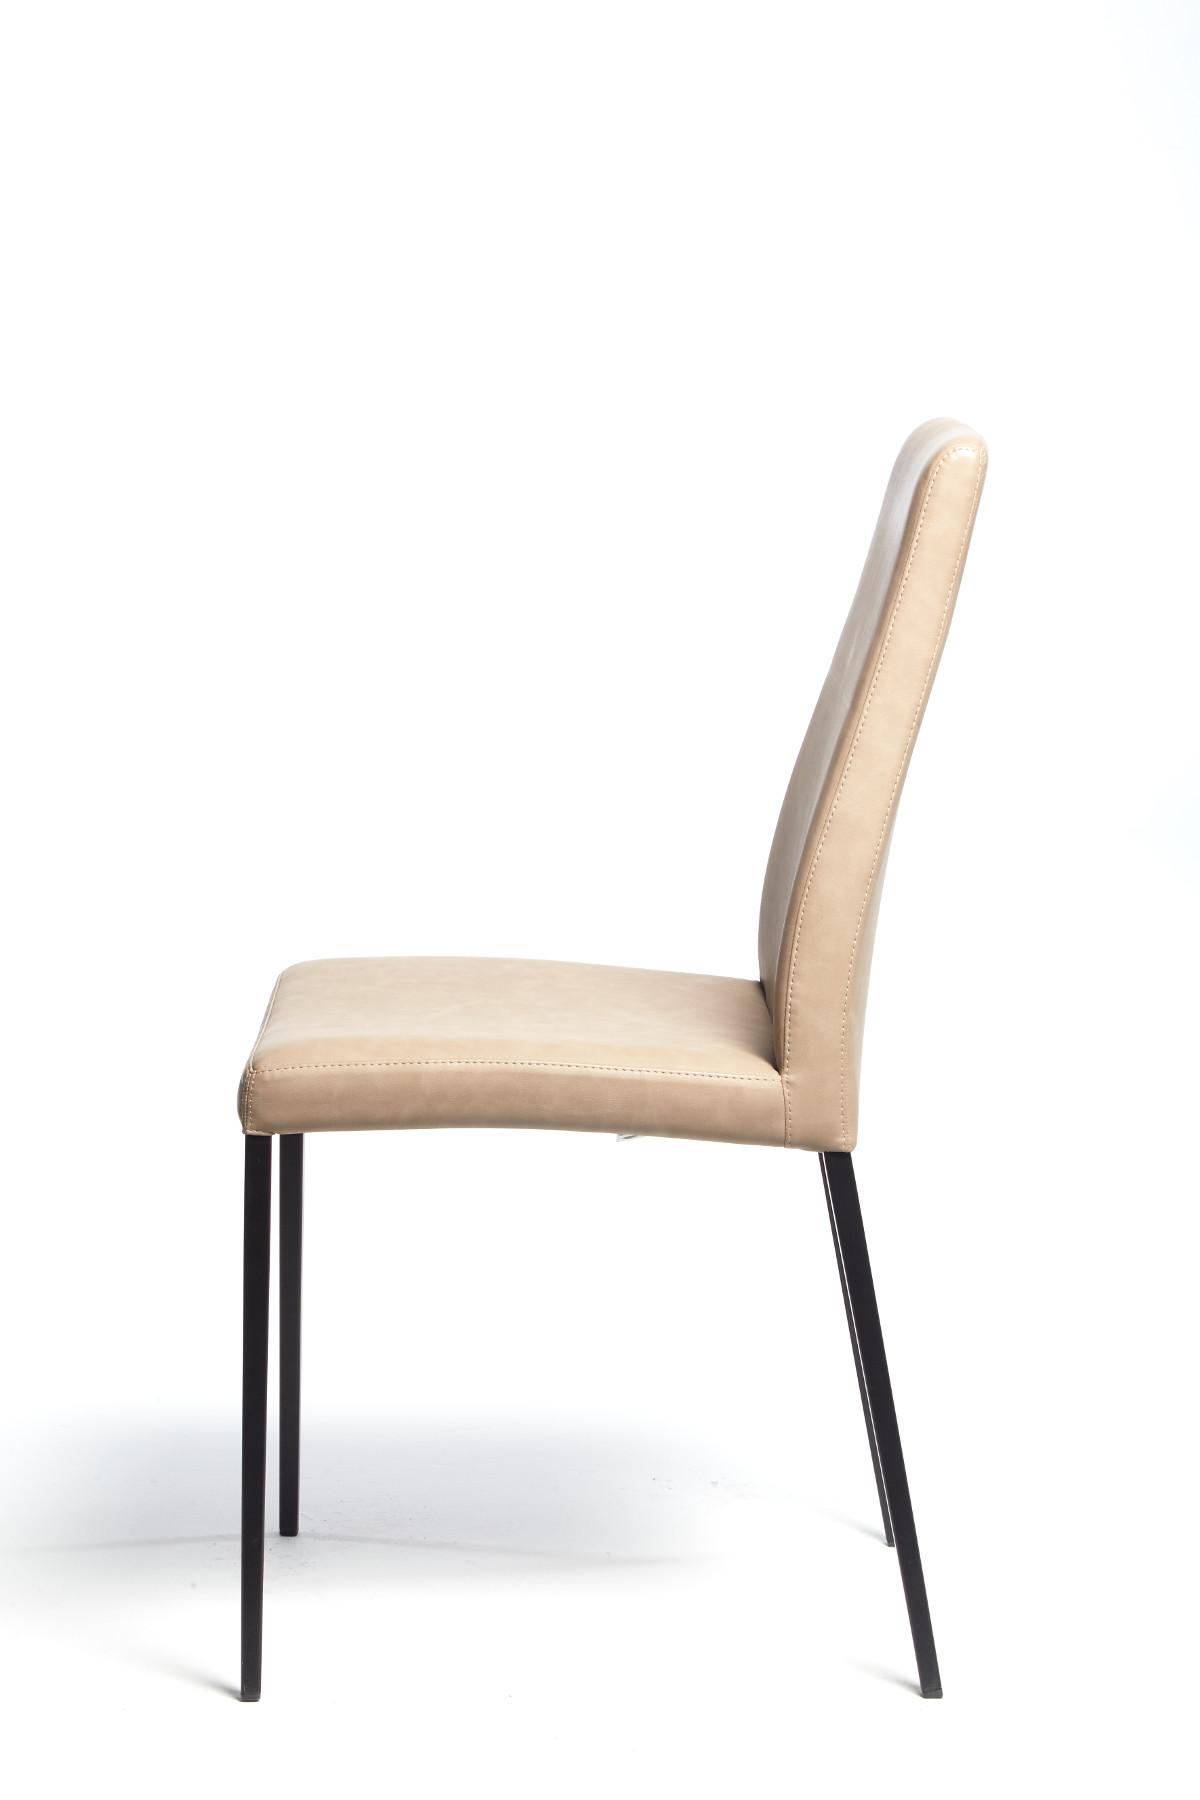 Calligaris Aida Soft Chair Vintage Desert